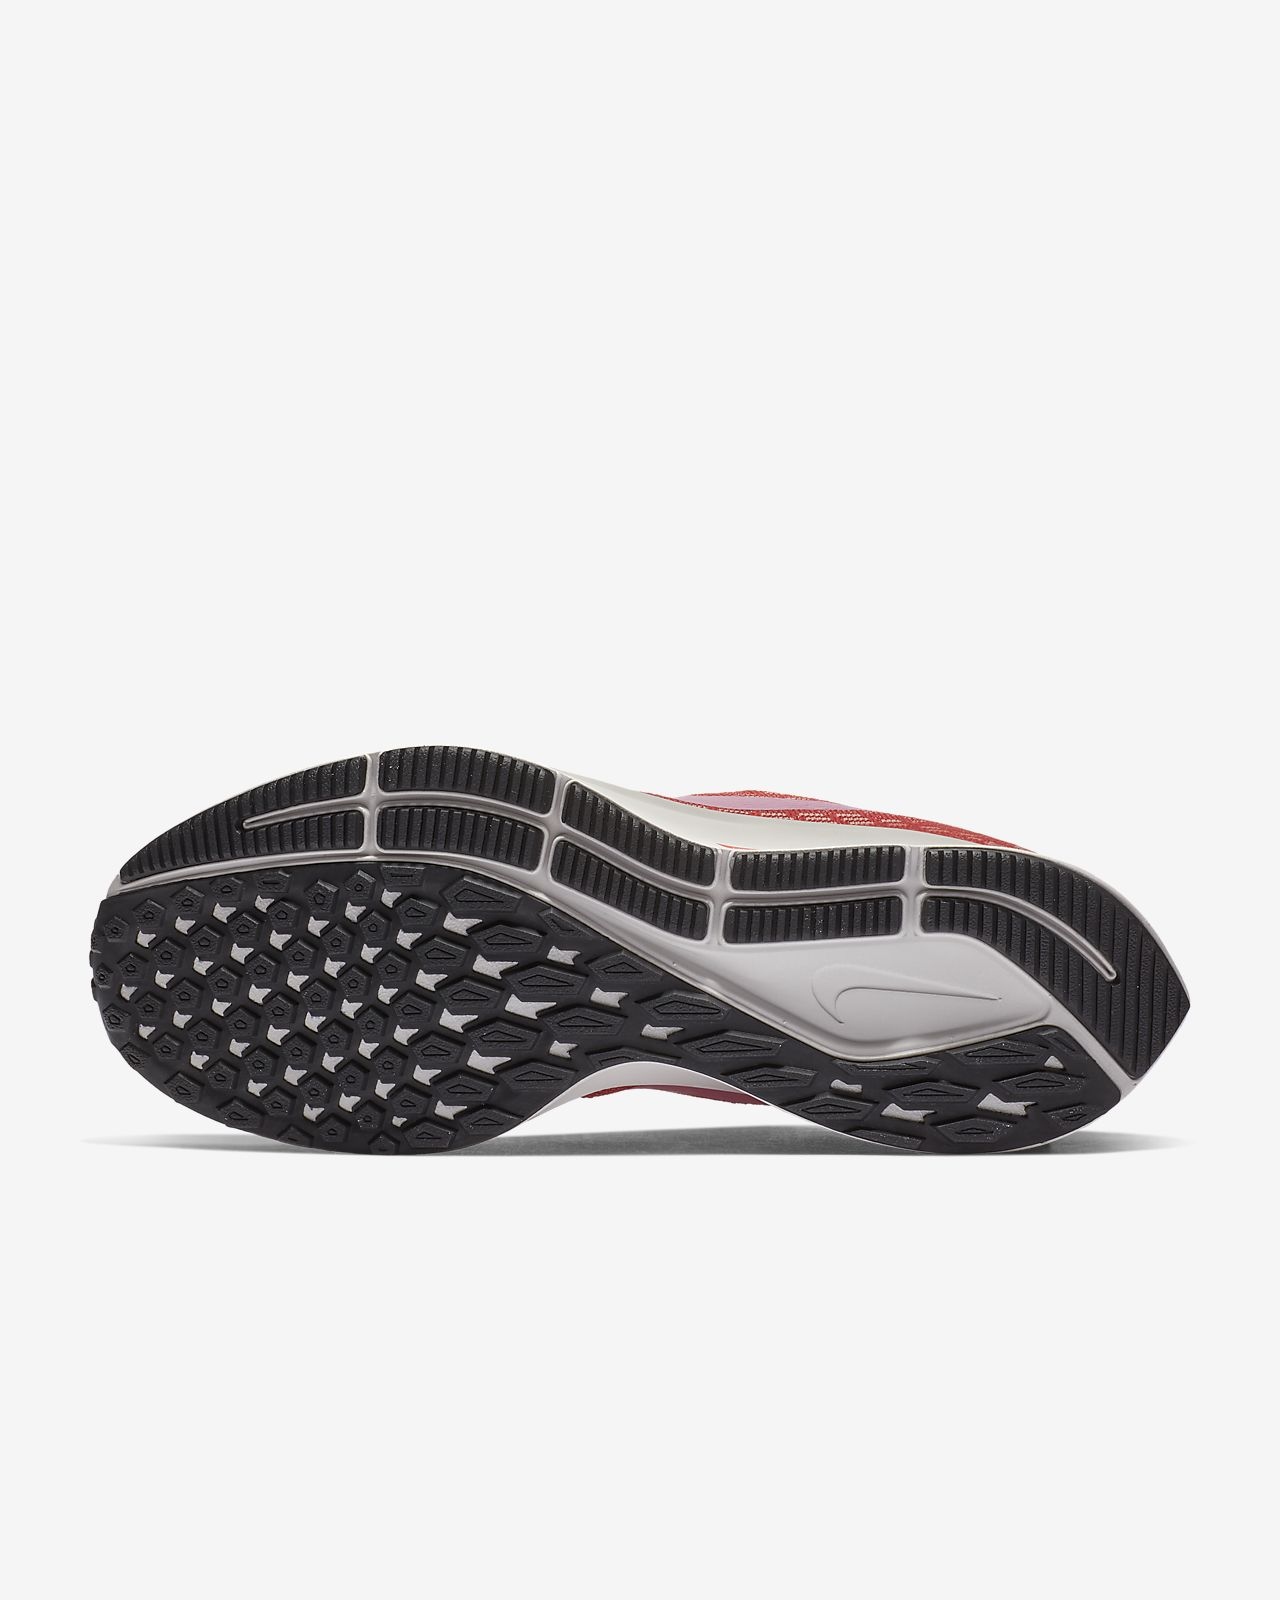 0e89d10254730 Nike Air Zoom Pegasus 35 Women s Running Shoe. Nike.com GB